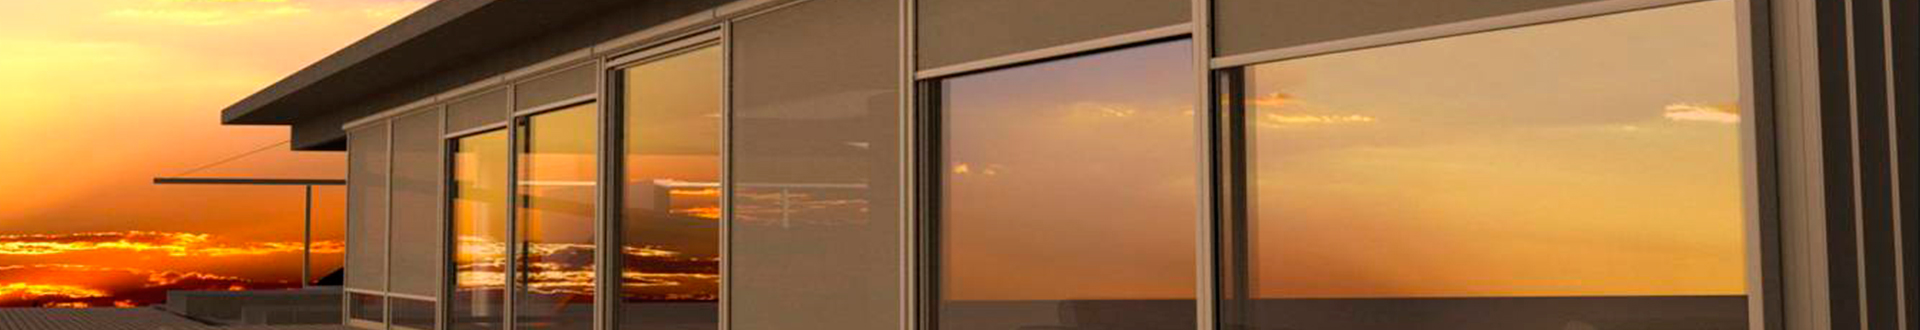 topo-toldos-cortinas